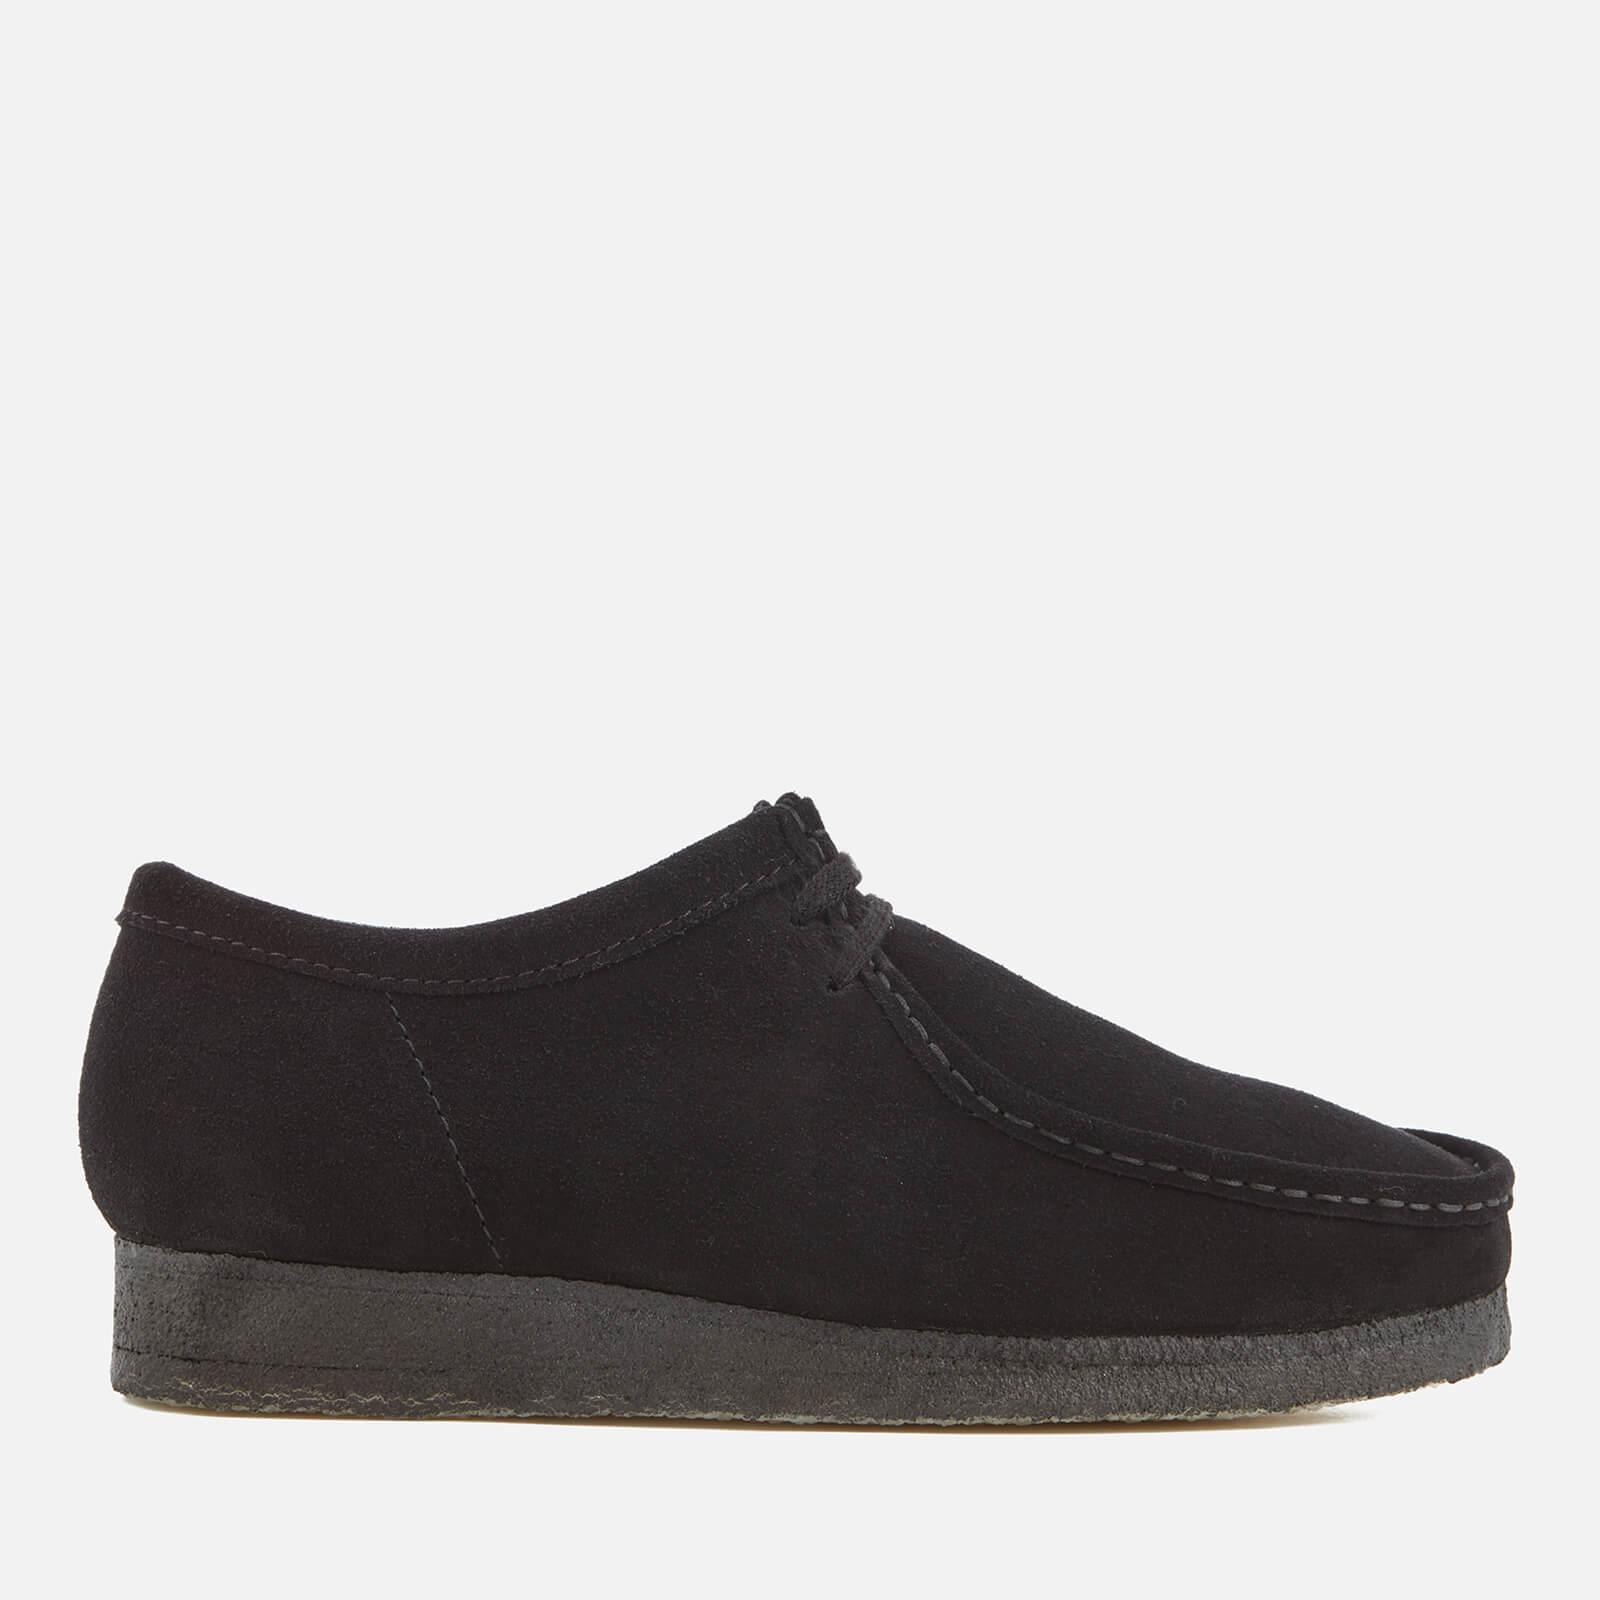 Clarks Originals Men's Wallabee Suede Shoes - Black - UK 9 - Black